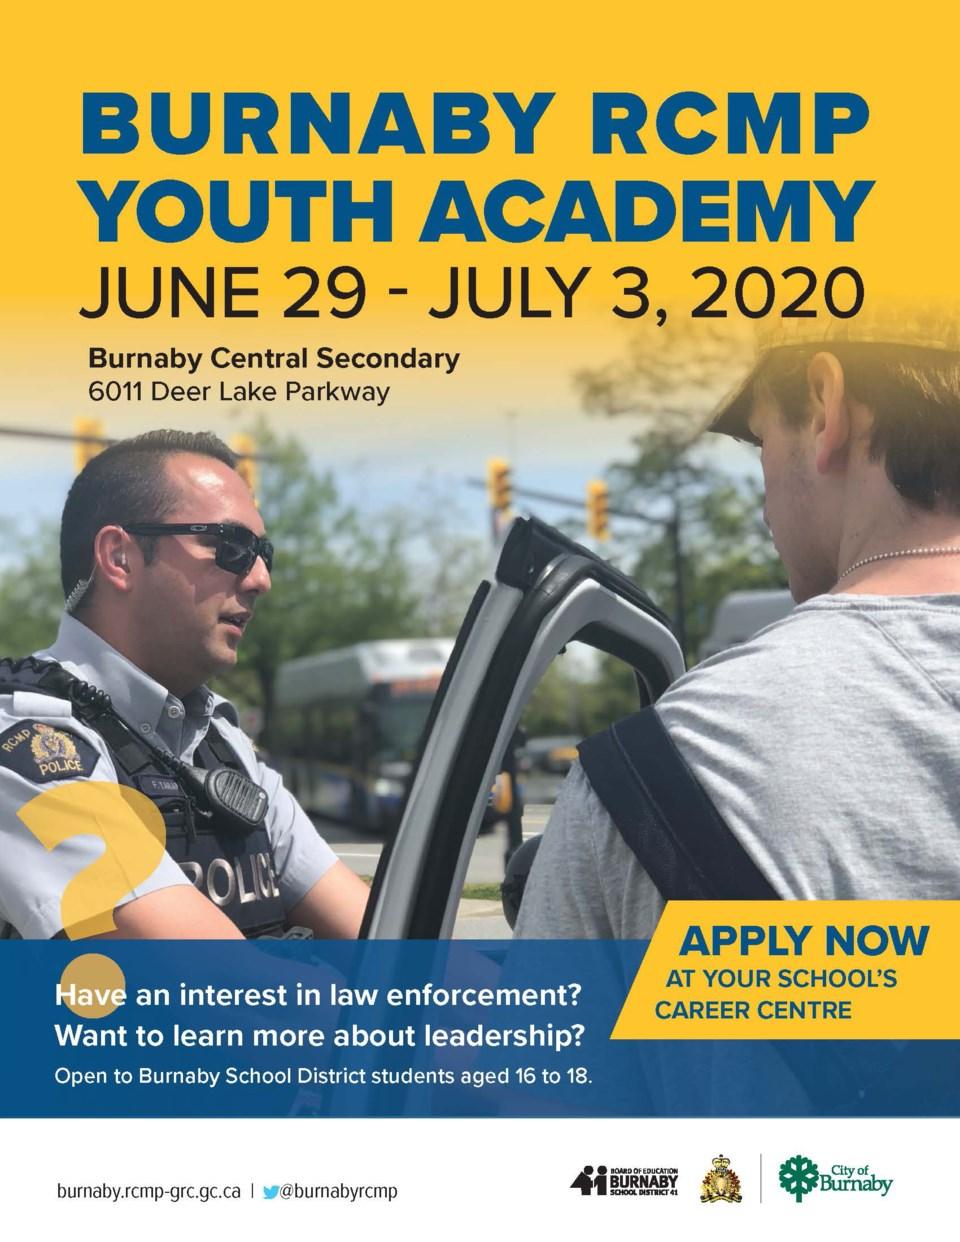 Burnaby RCMP youth academy